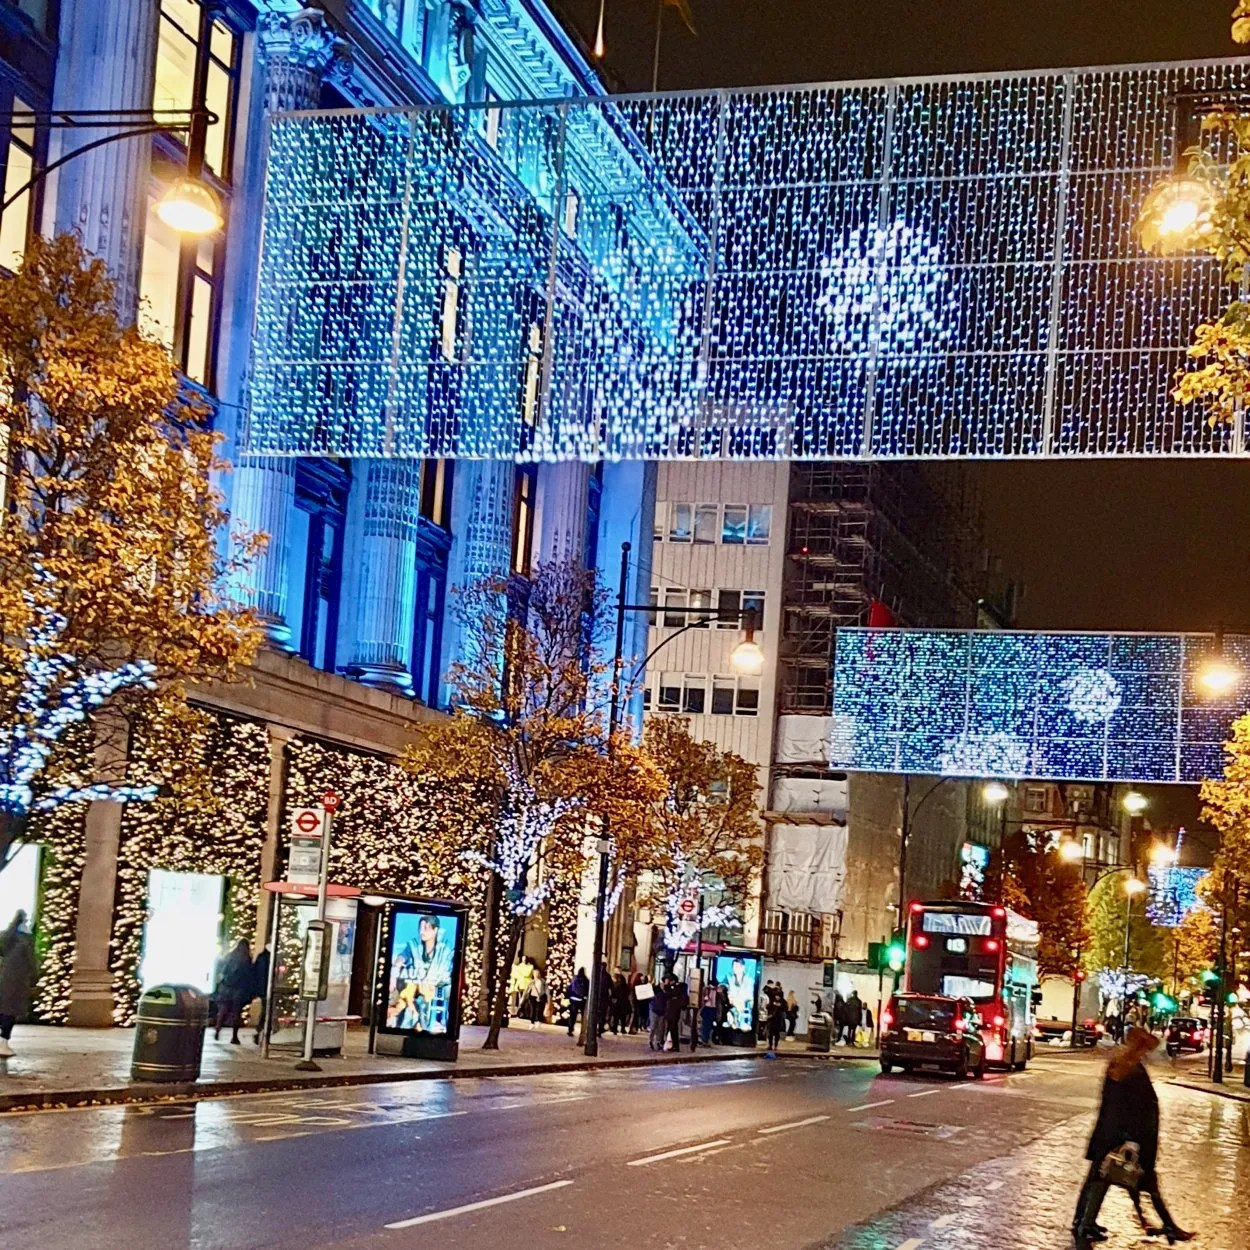 Sheets of LED Christmas lights Oxford Street London